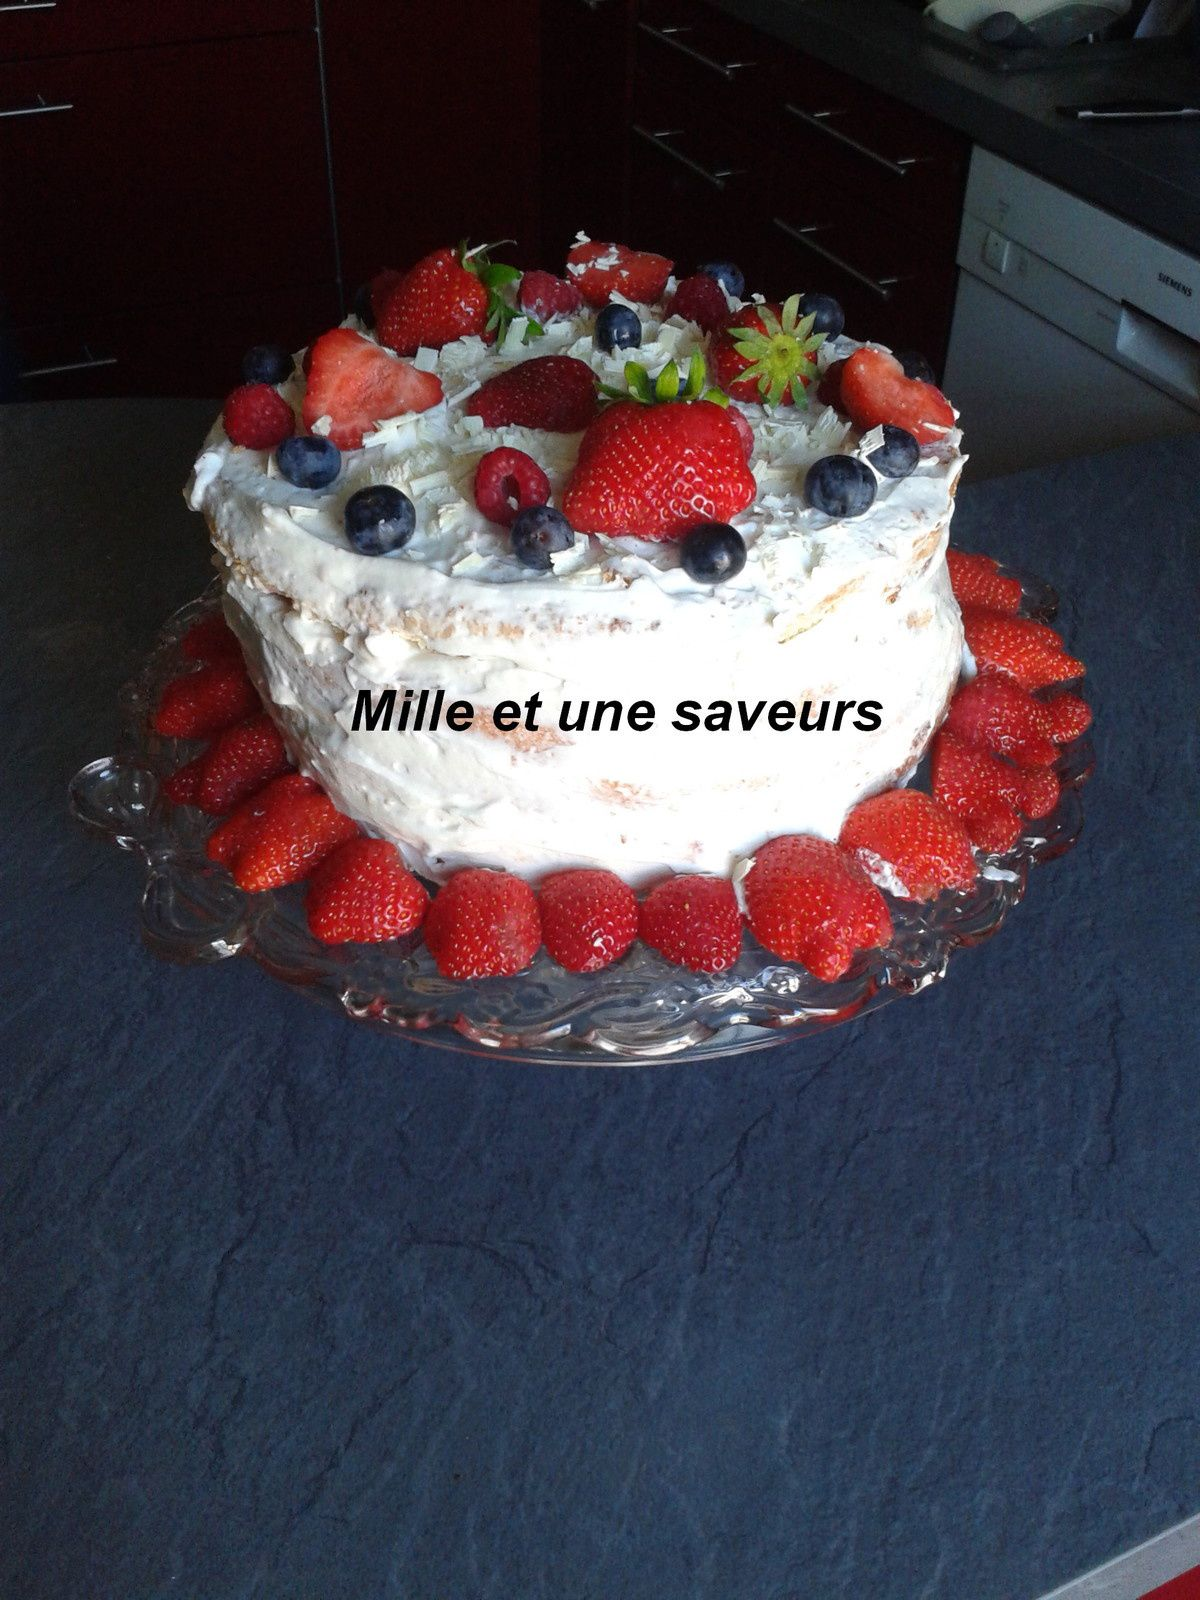 Le gâteau nu : Naked cake - Gâteau à croquer